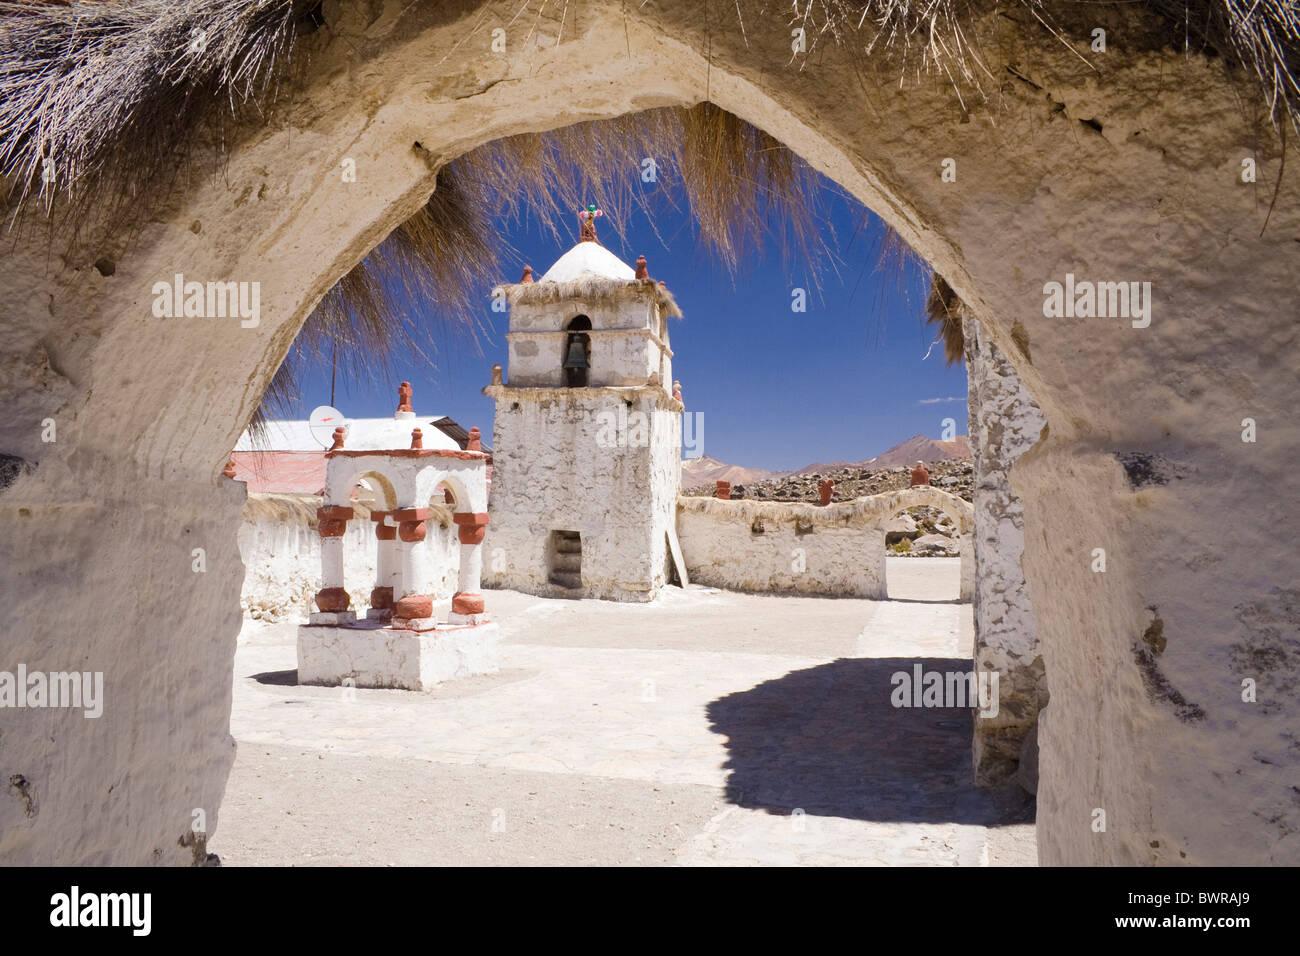 chile south america parinacota village adobe church traditional